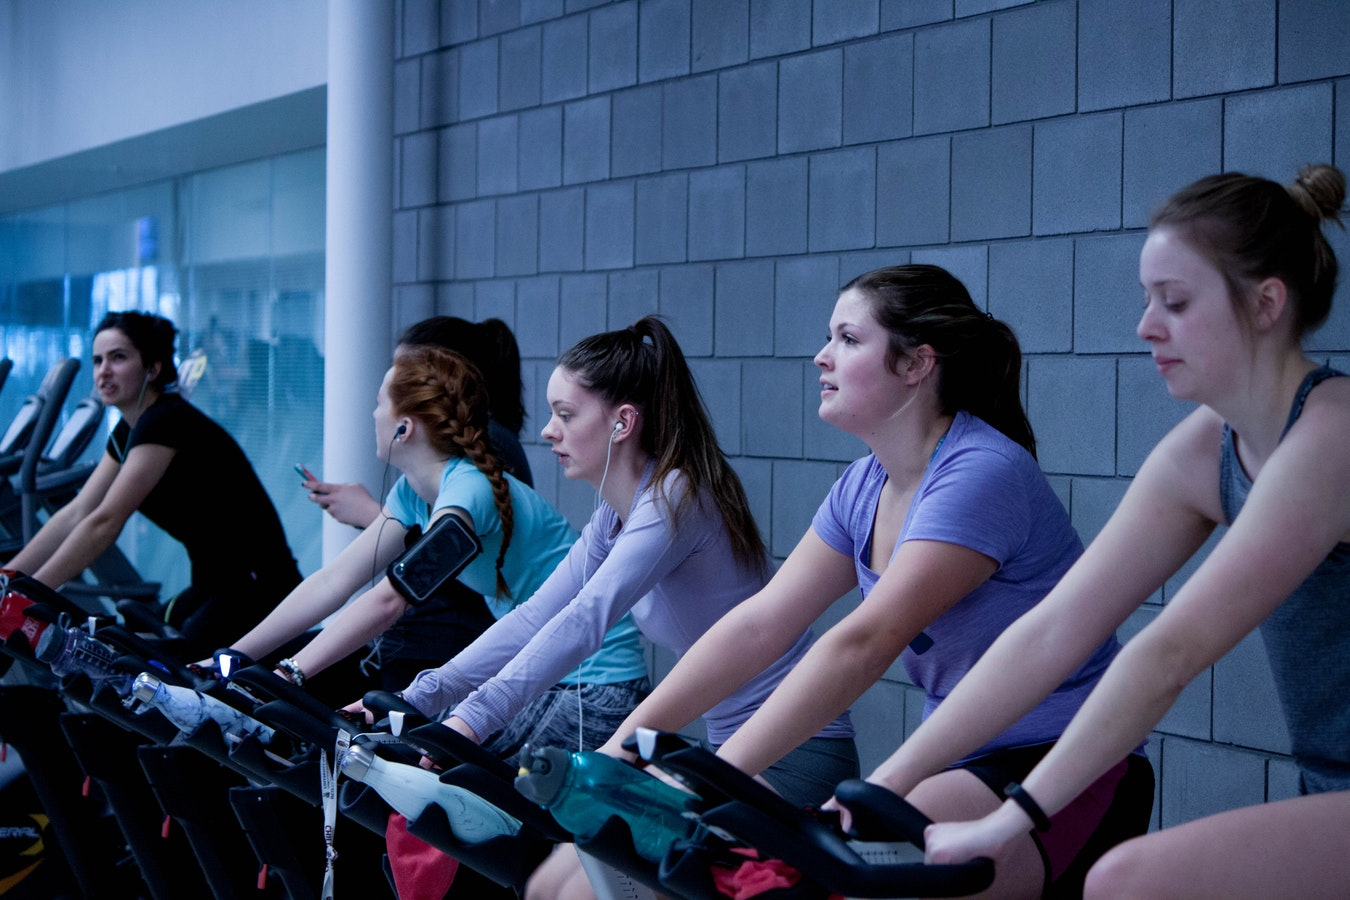 Women exercising, public domain